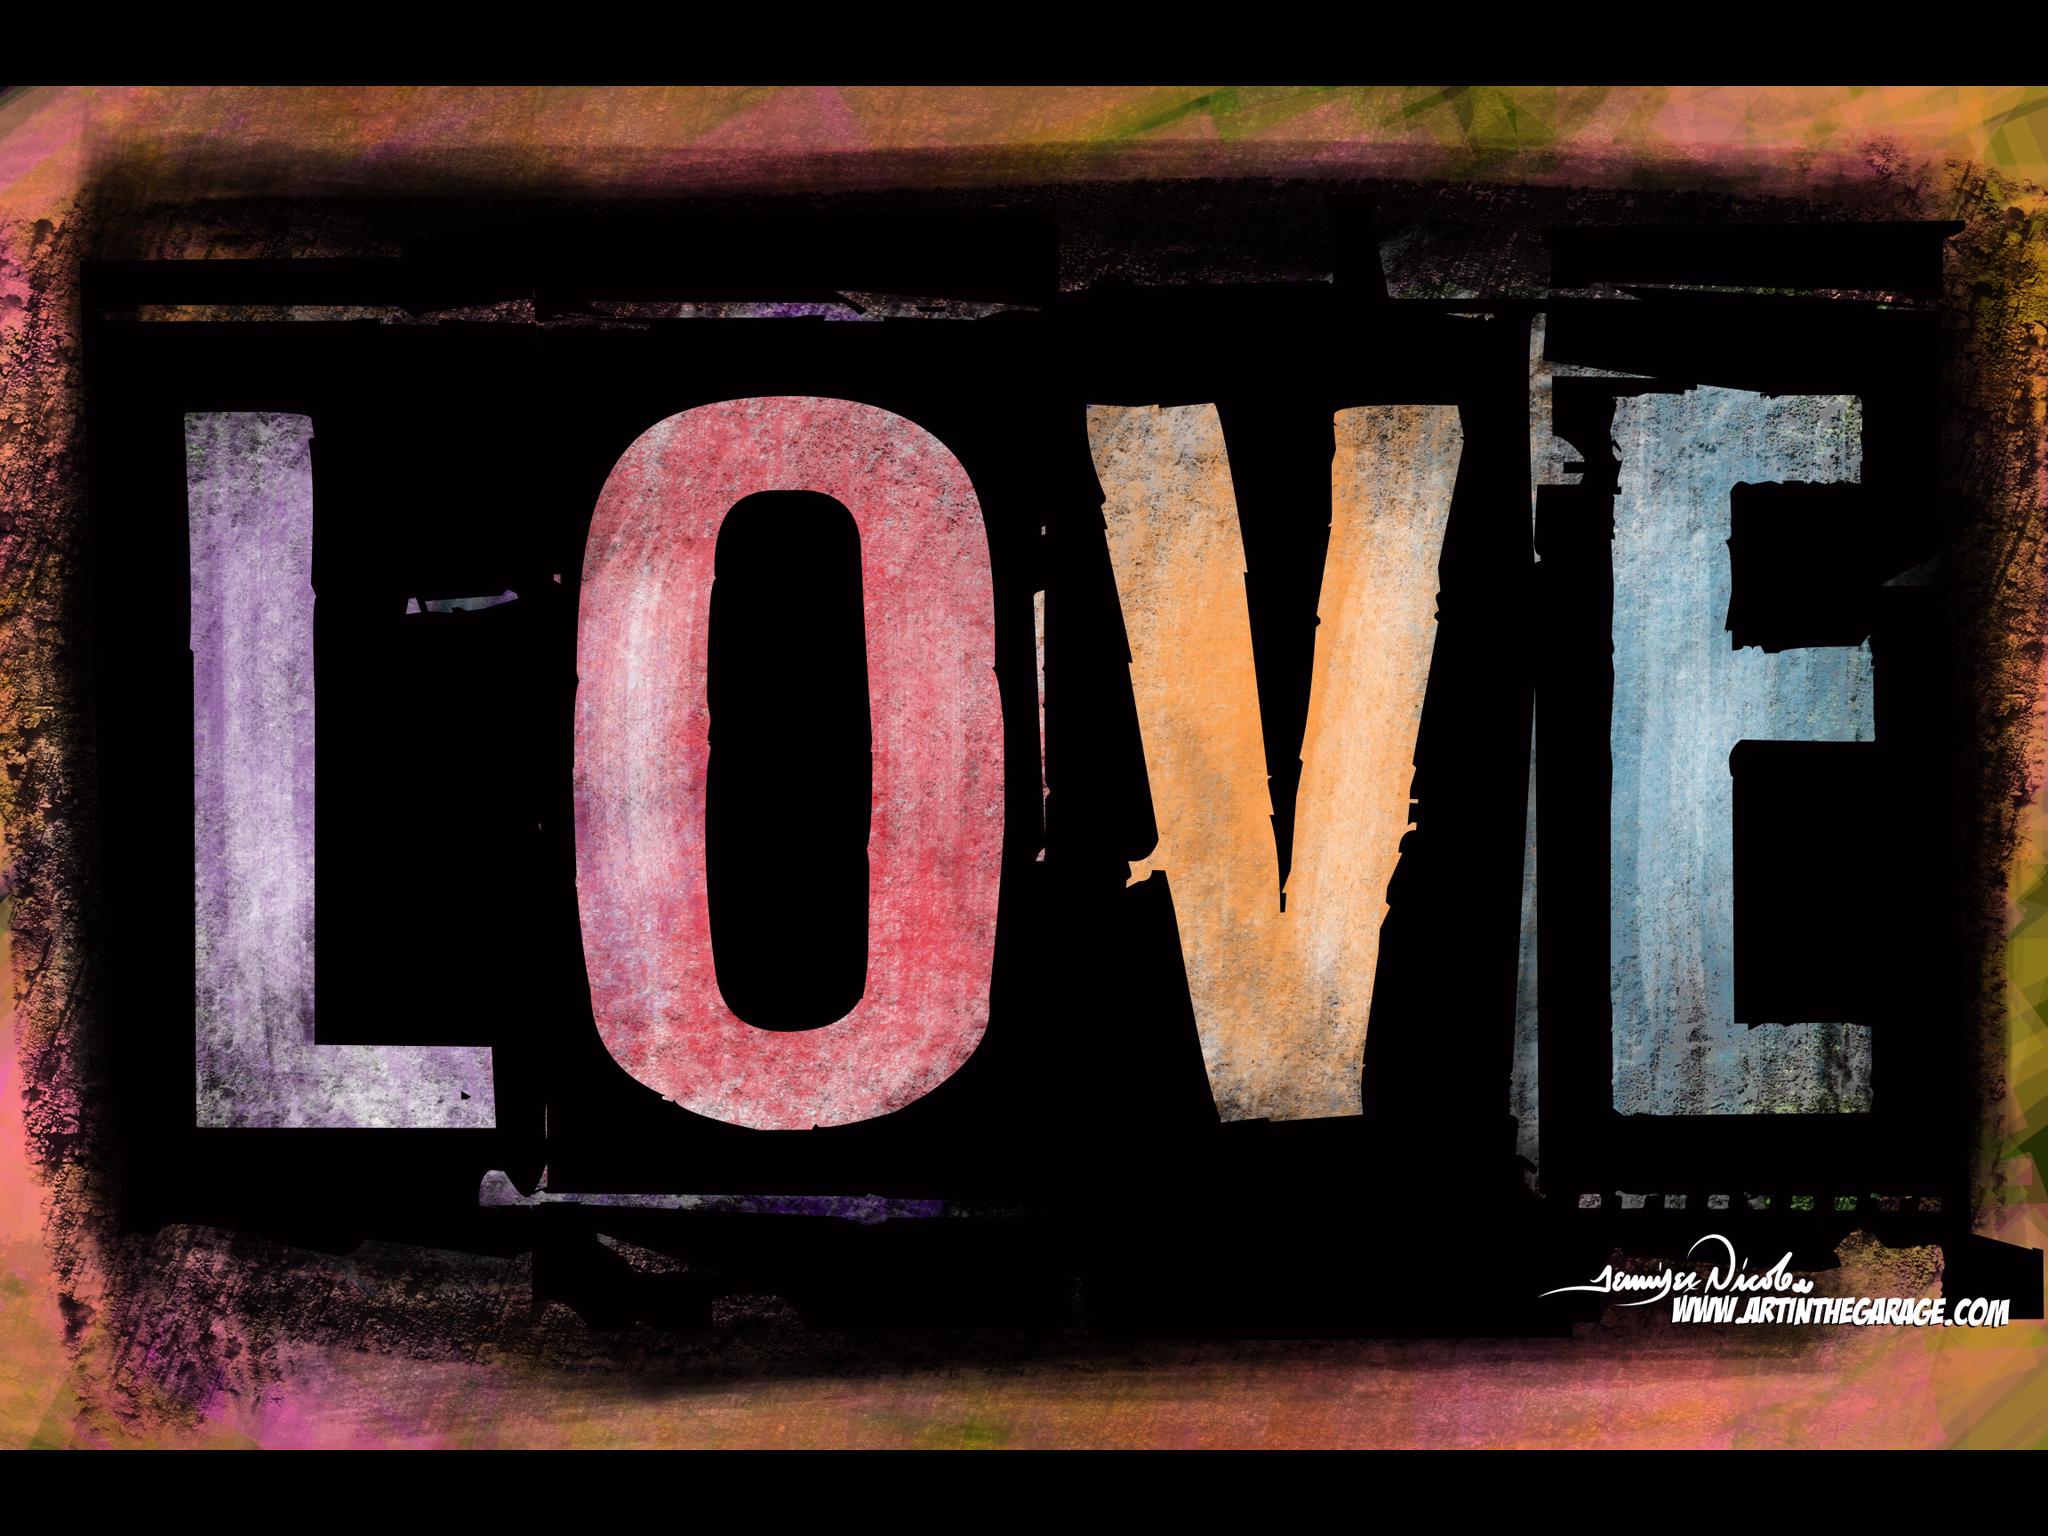 12-23-19 Love